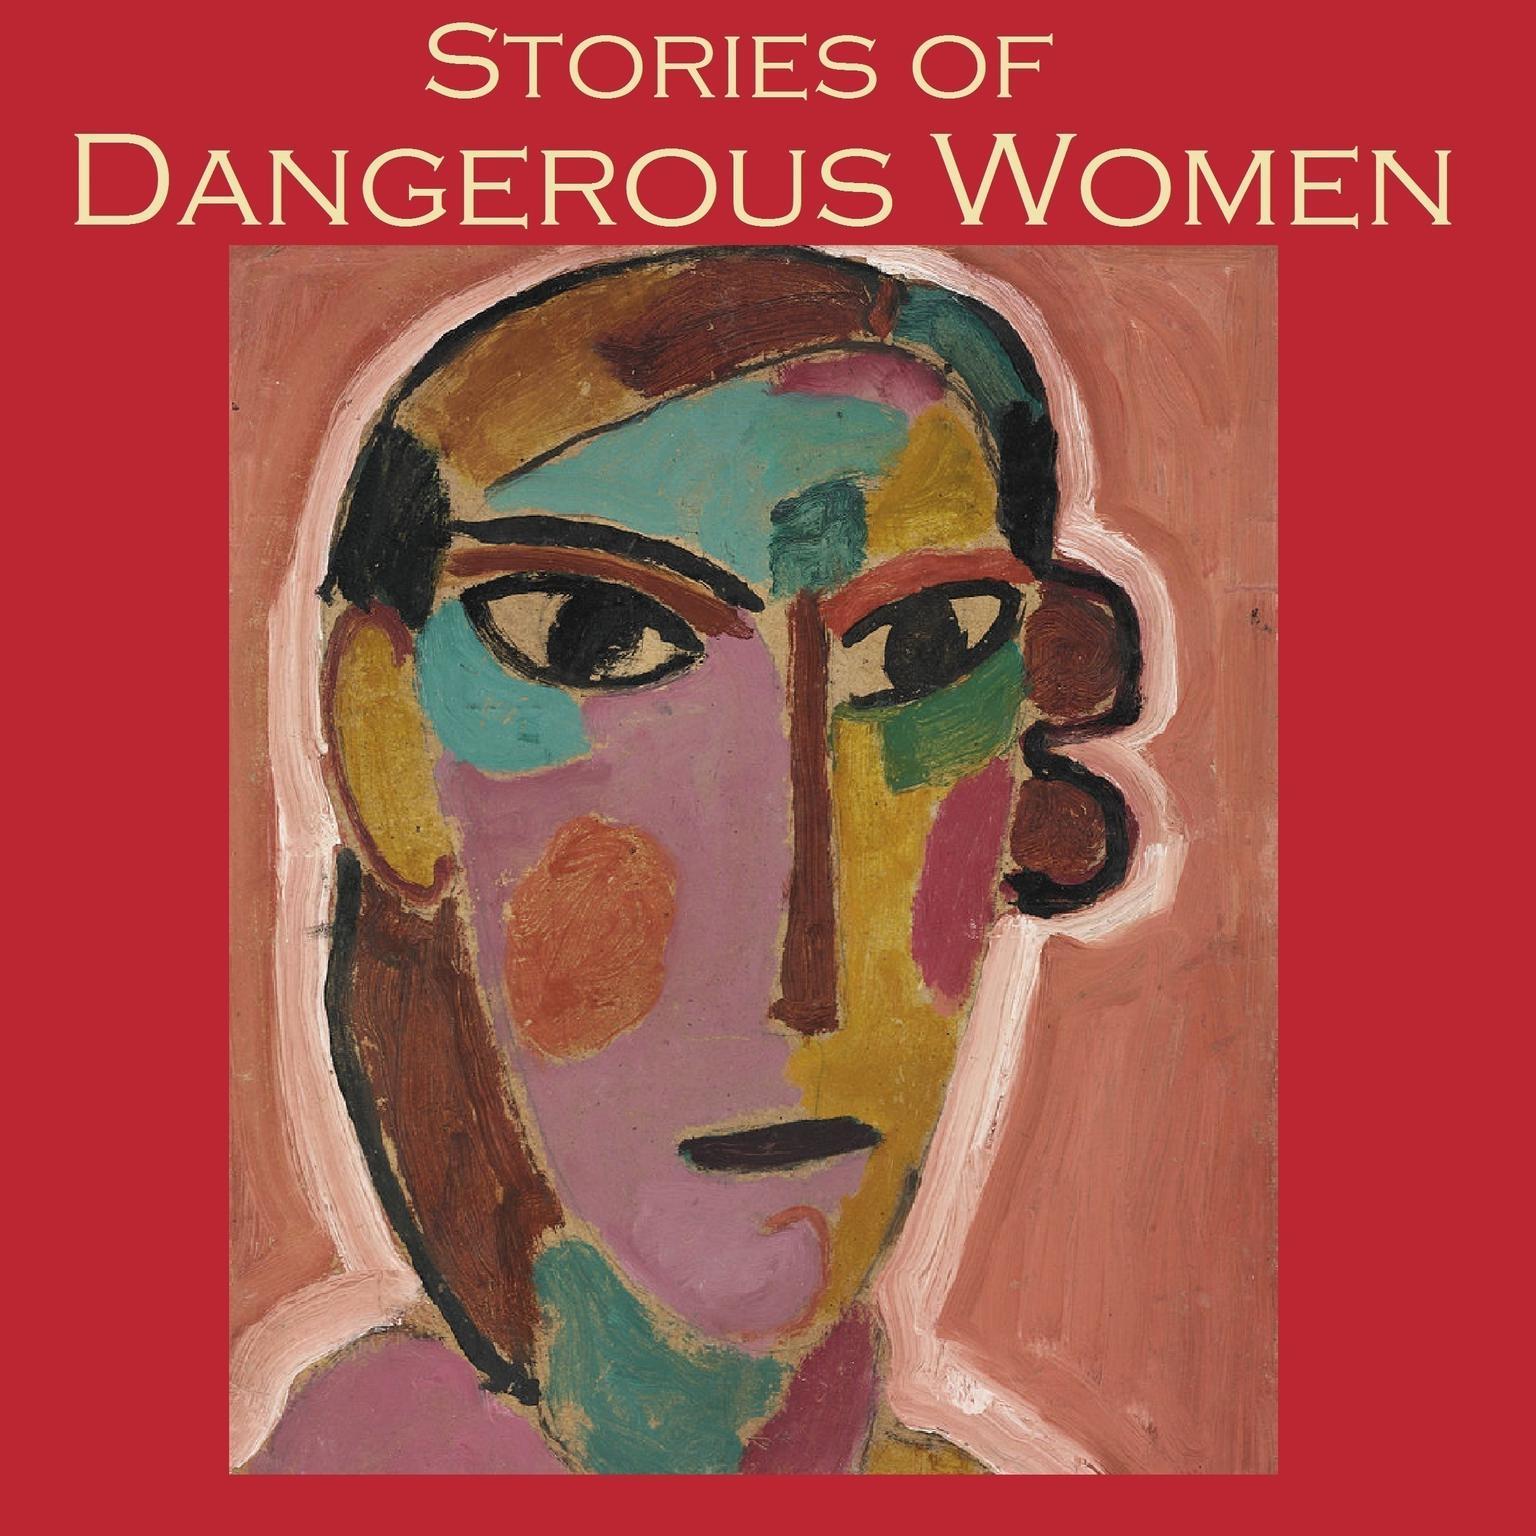 Stories of Dangerous Women Audiobook, by Various